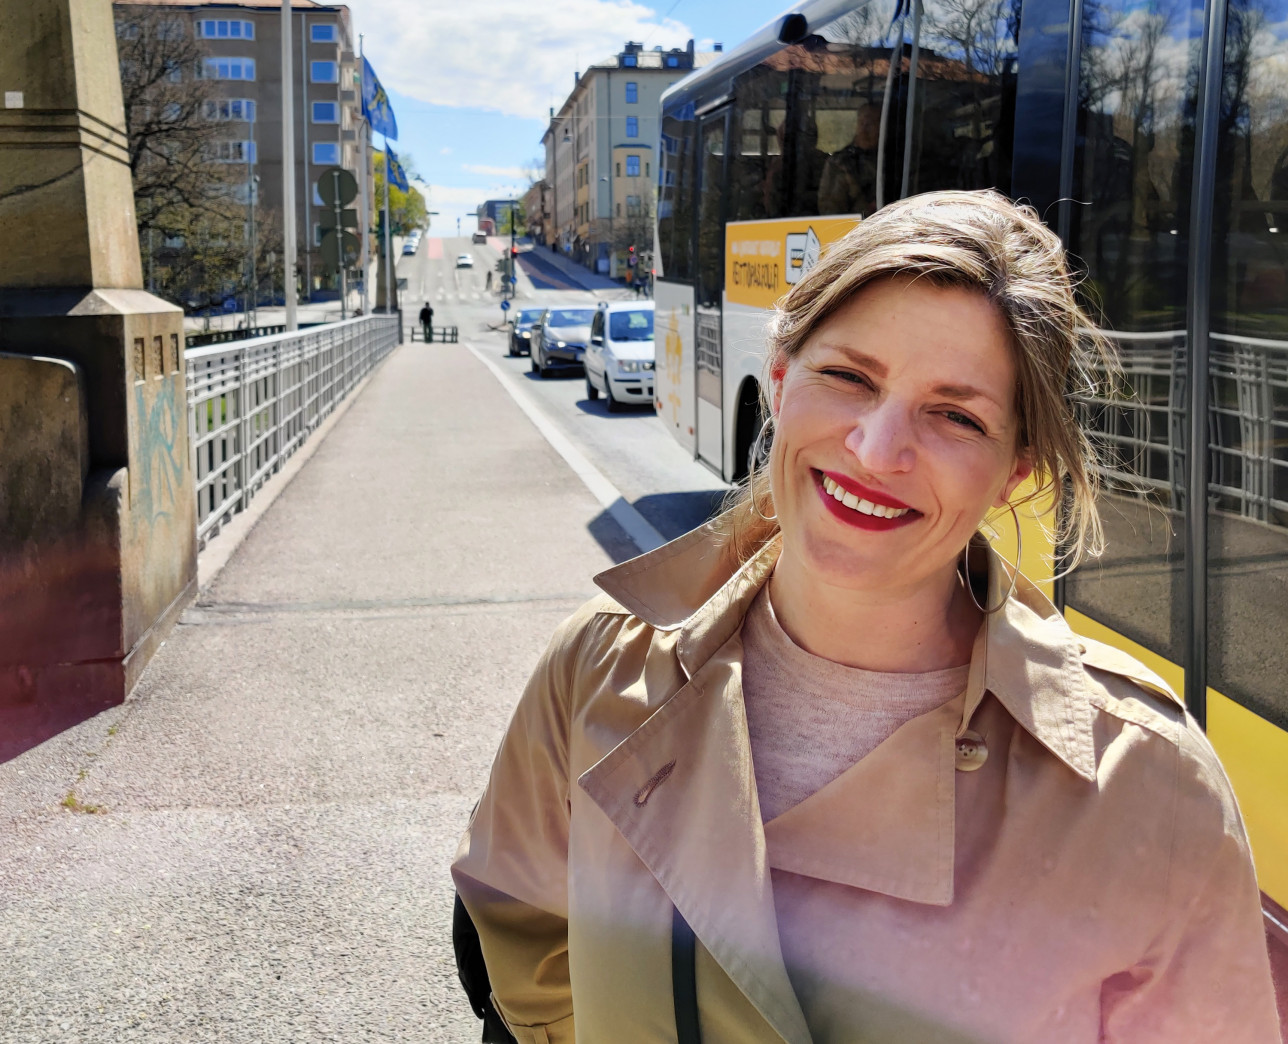 Anu Perho hymyilee kadulla kesällä.